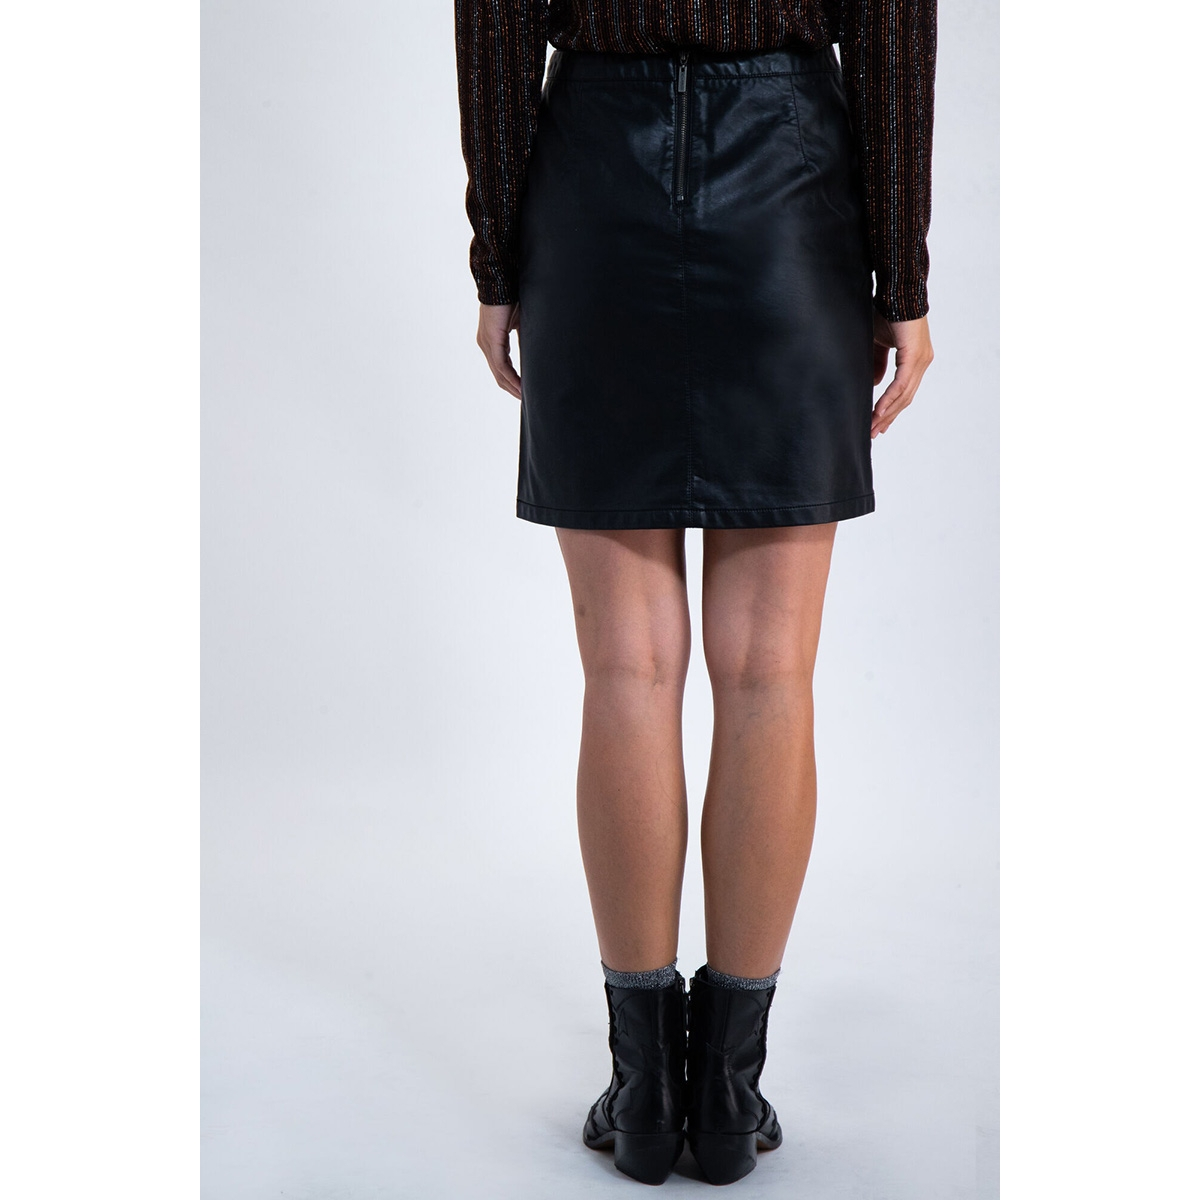 leatherlook rokje k90120 garcia rok 60 black